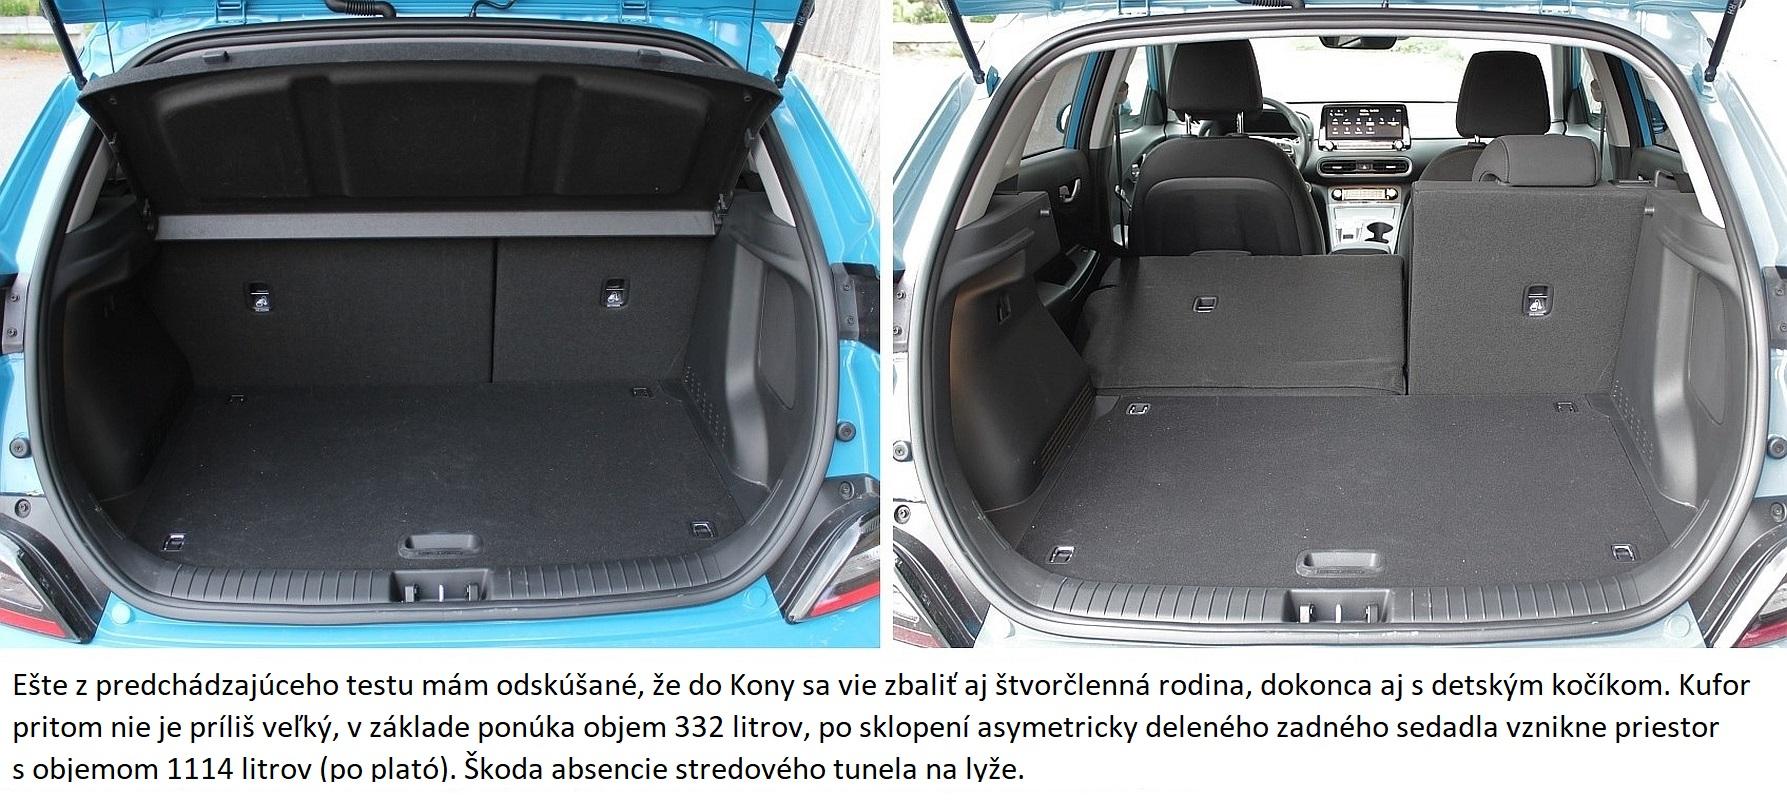 Hyundai kona batozinovy priestor